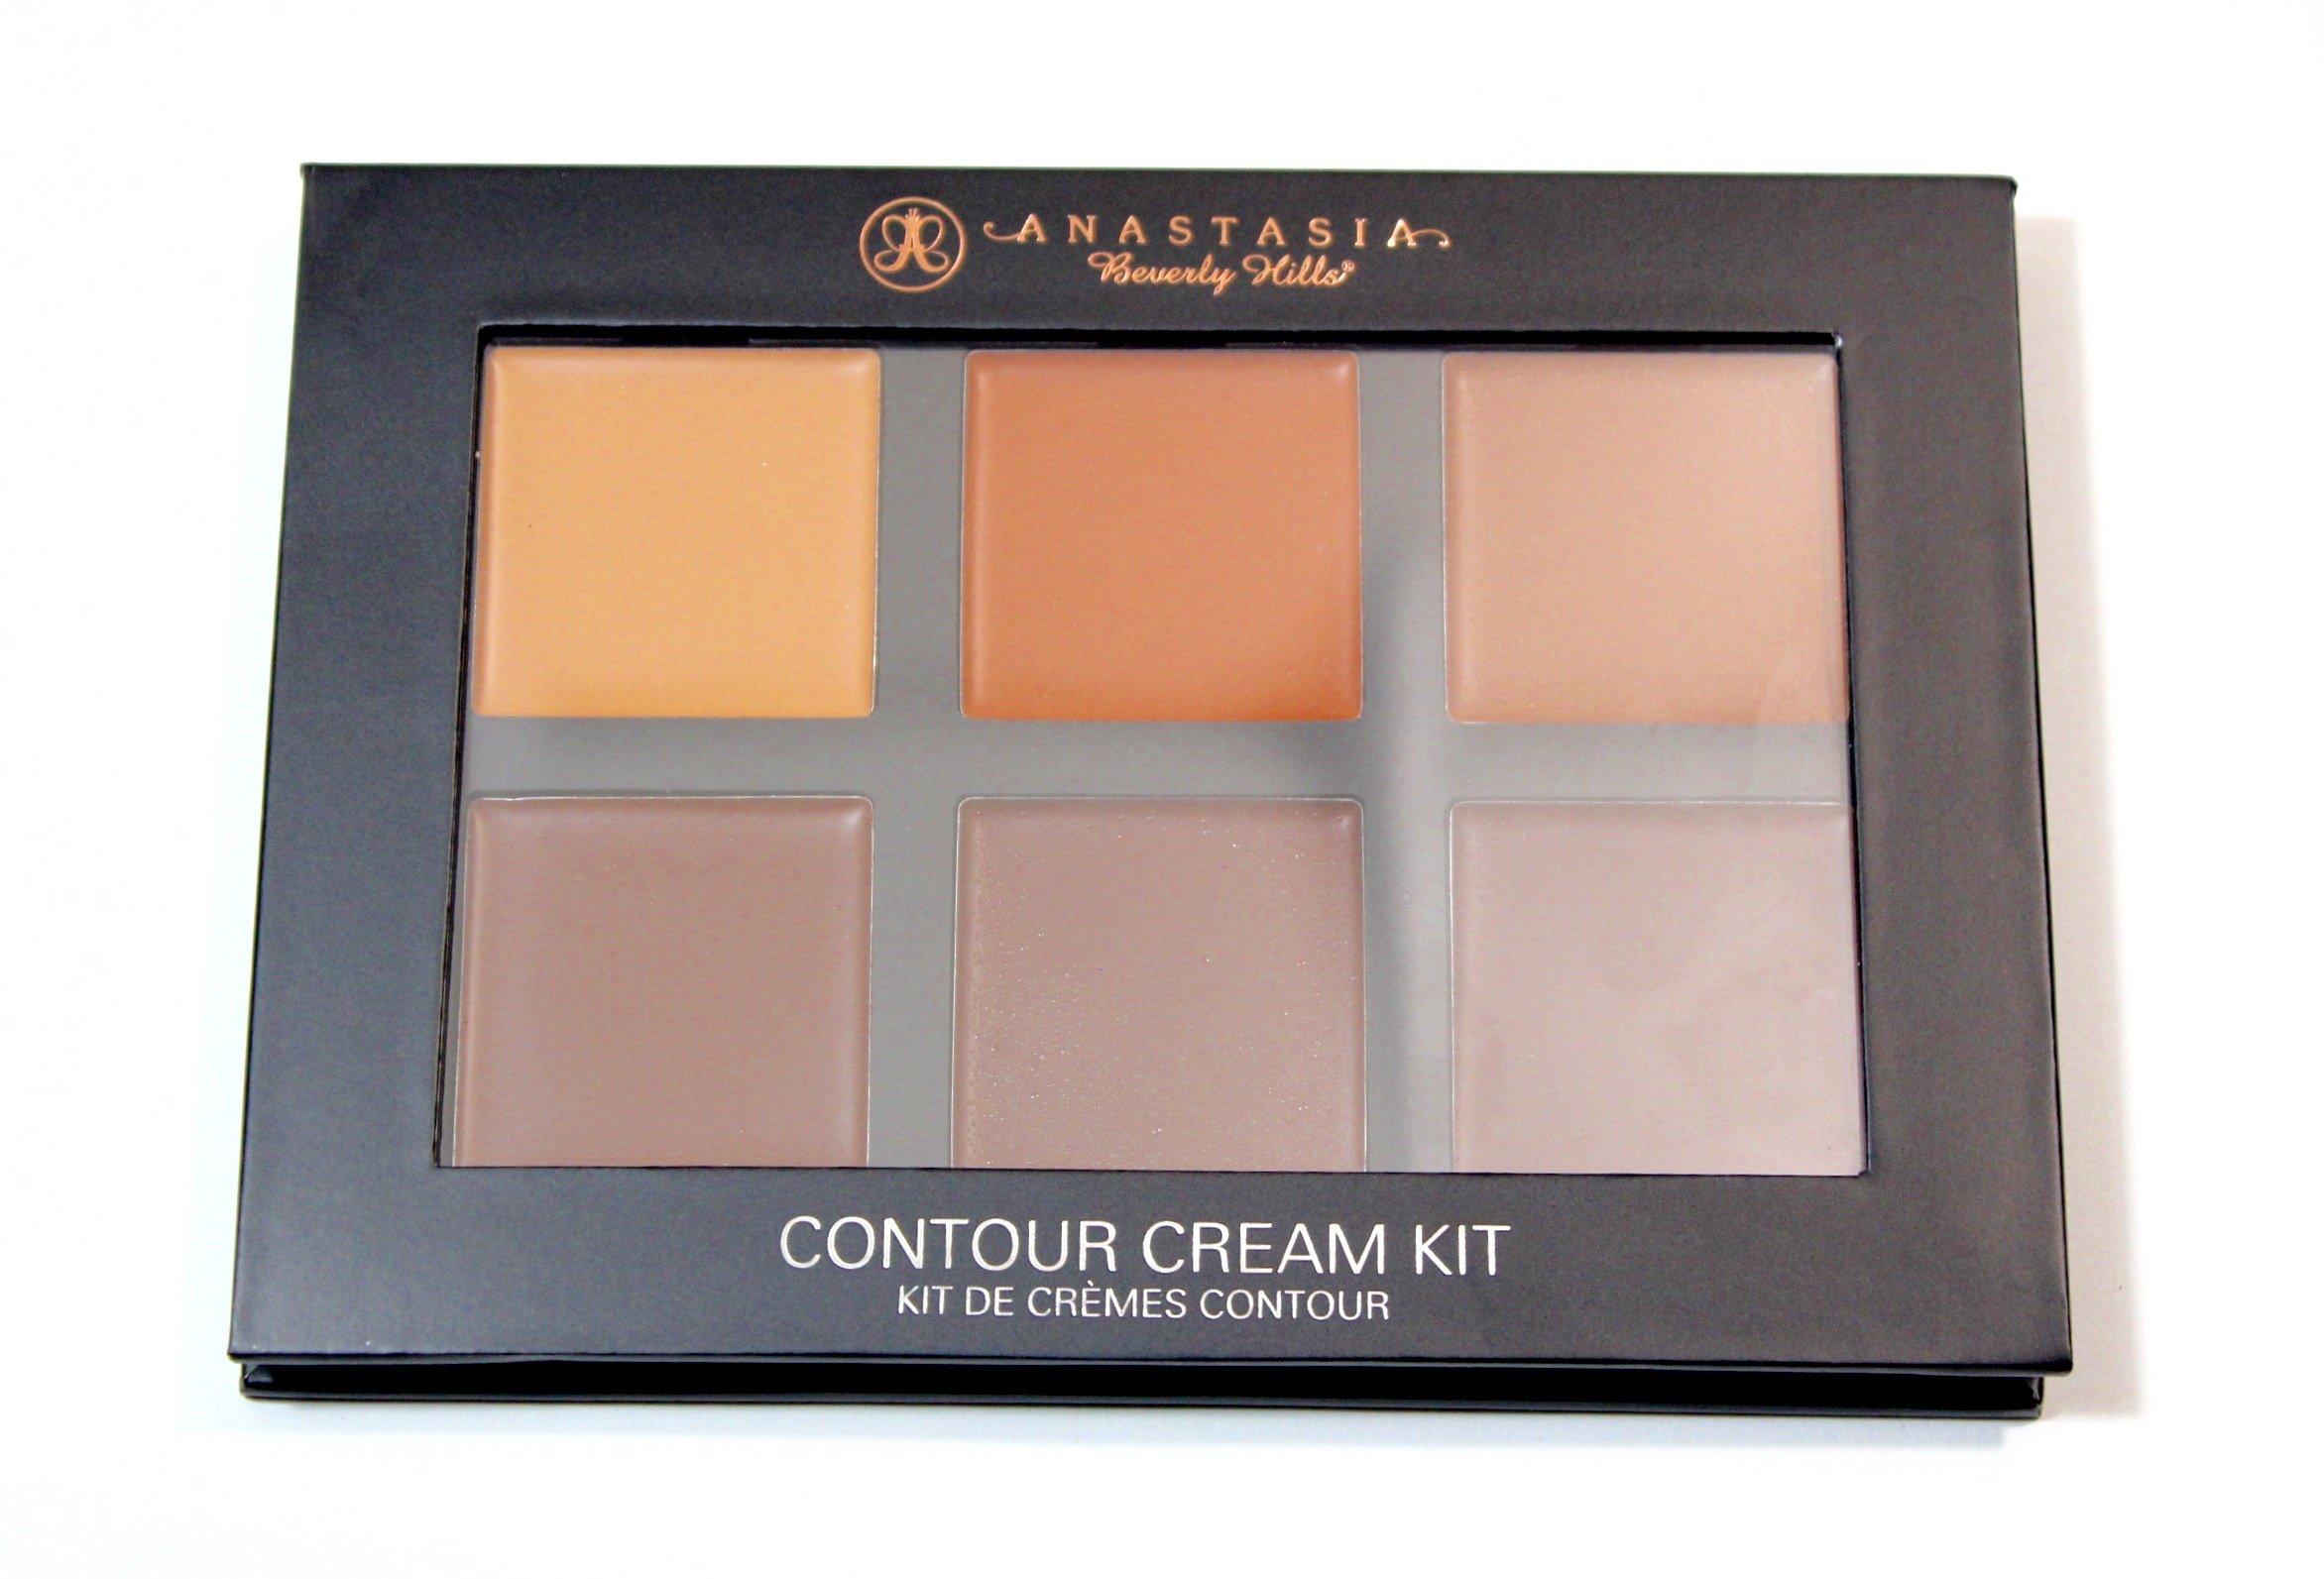 (2 pack) Anastasia Beverly Hills - Contour Cream Kits